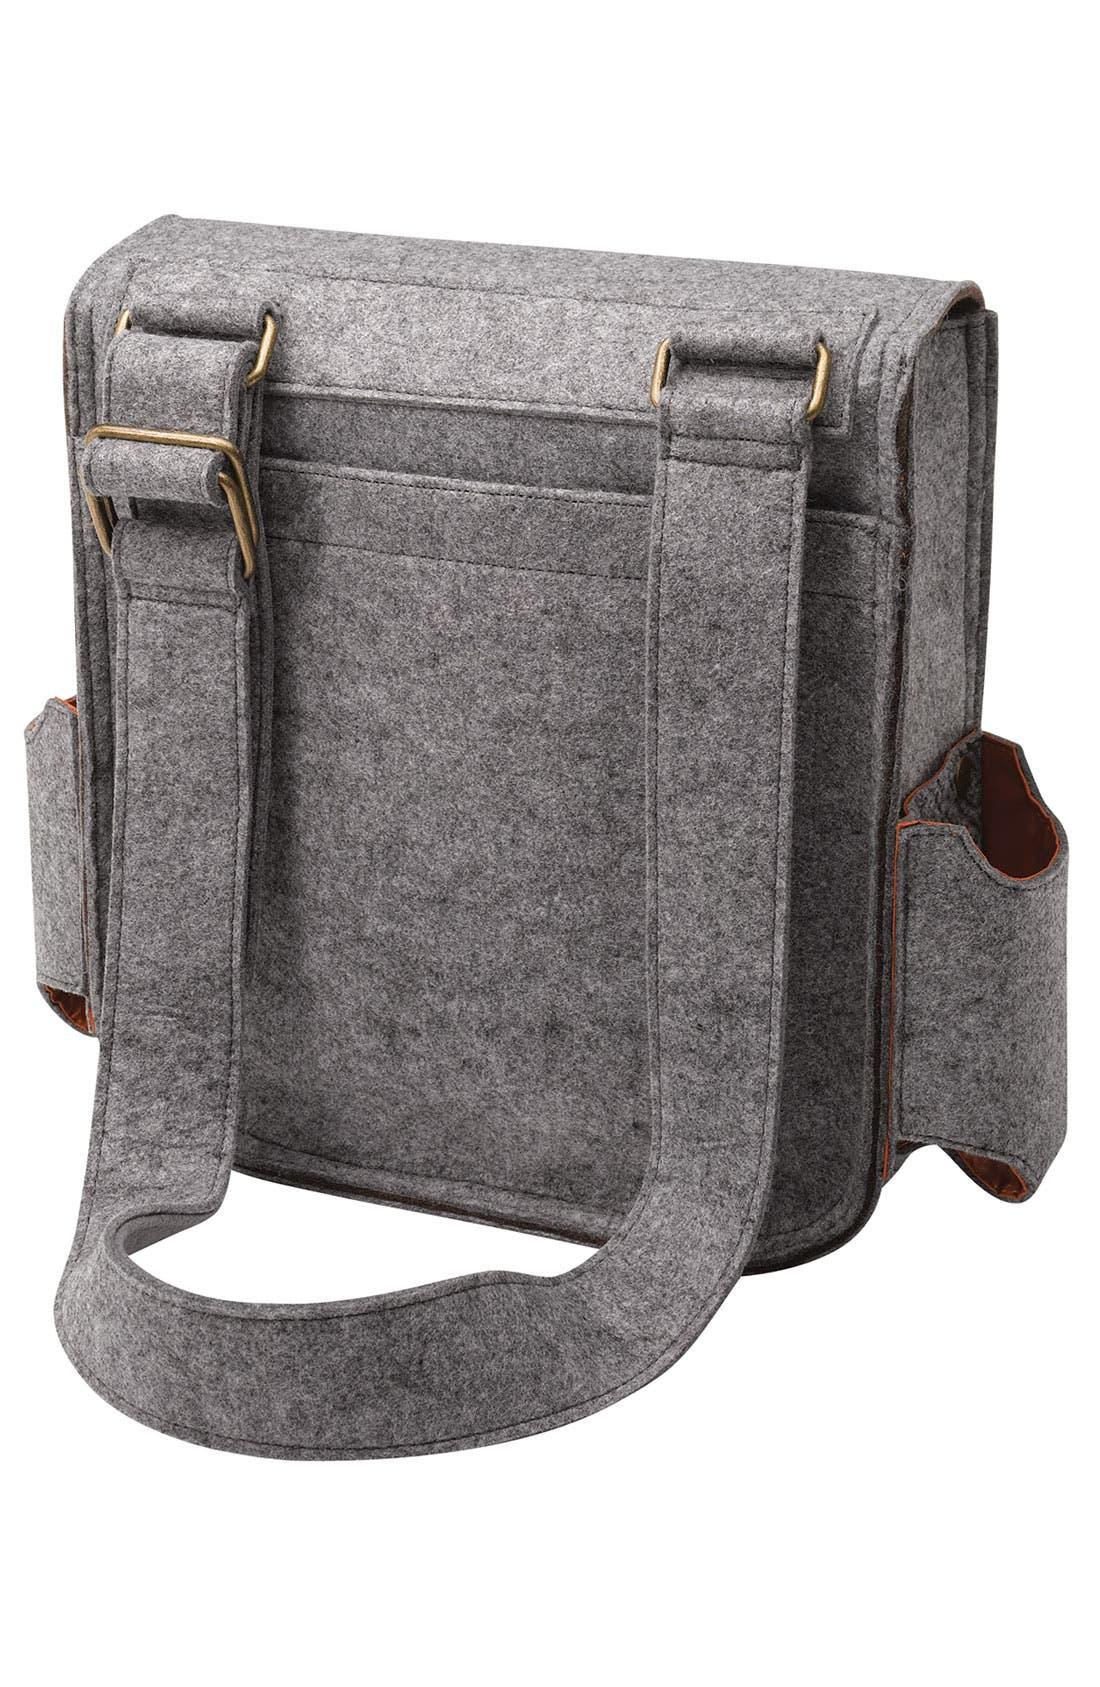 Alternate Image 3  - Petunia Pickle Bottom 'Scout Journey Pack ' Diaper Bag